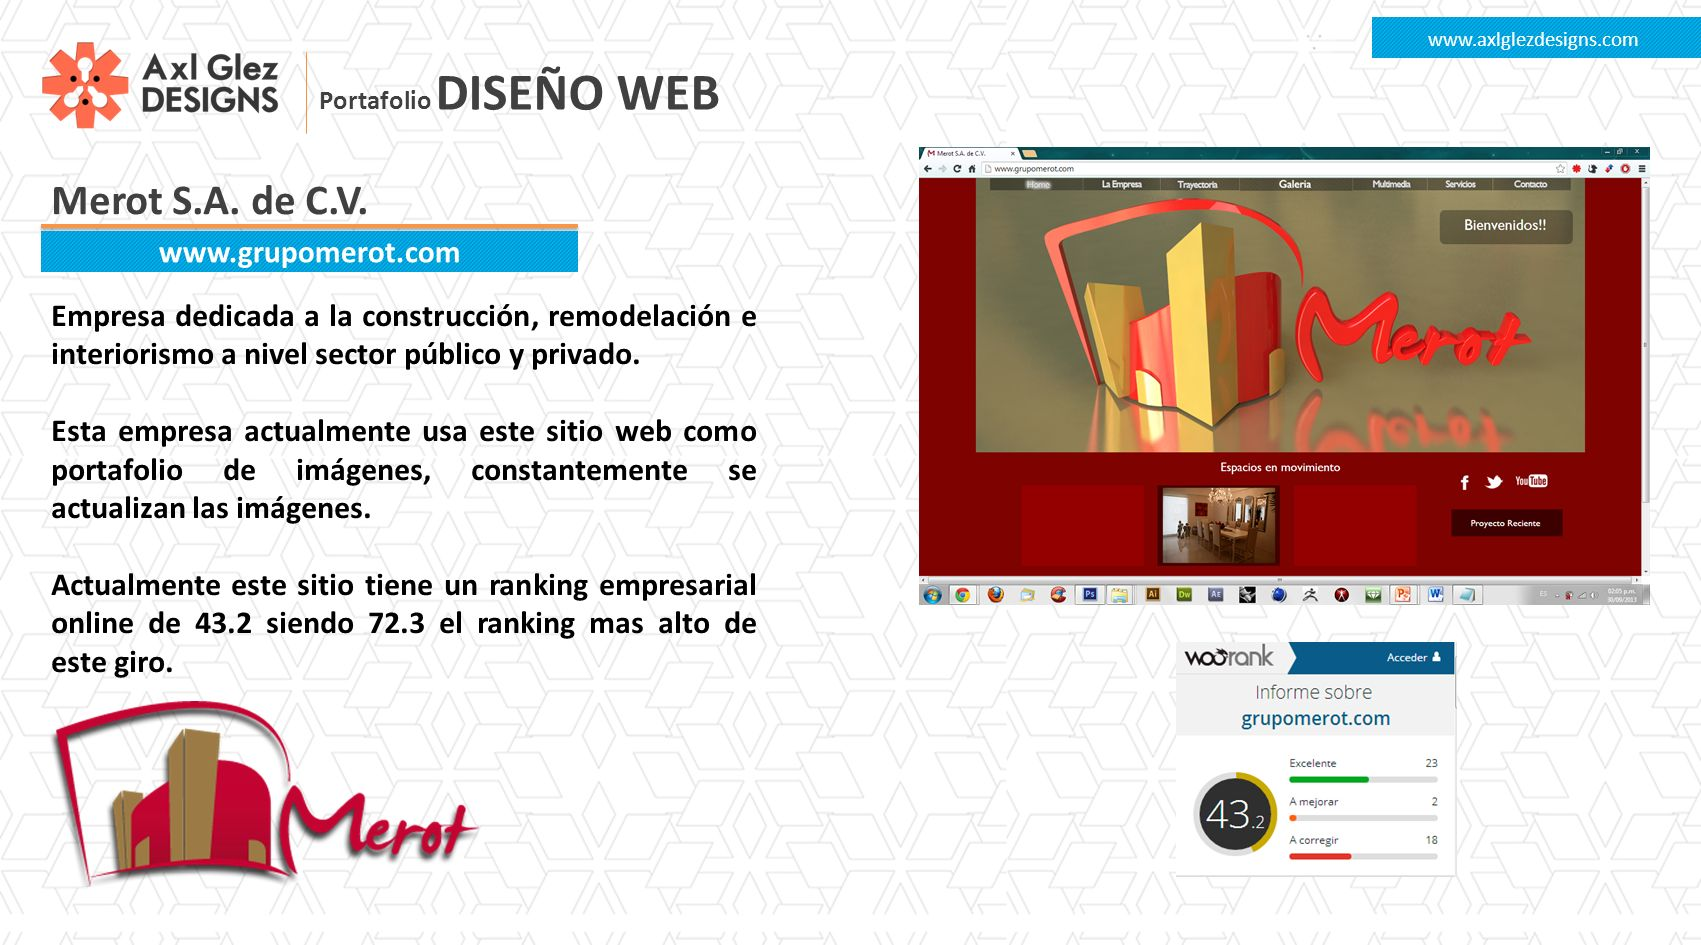 Merot S.A. de C.V. www.axlglezdesigns.com www.grupomerot.com Empresa dedicada a la construcción, remodelación e interiorismo a nivel sector público y